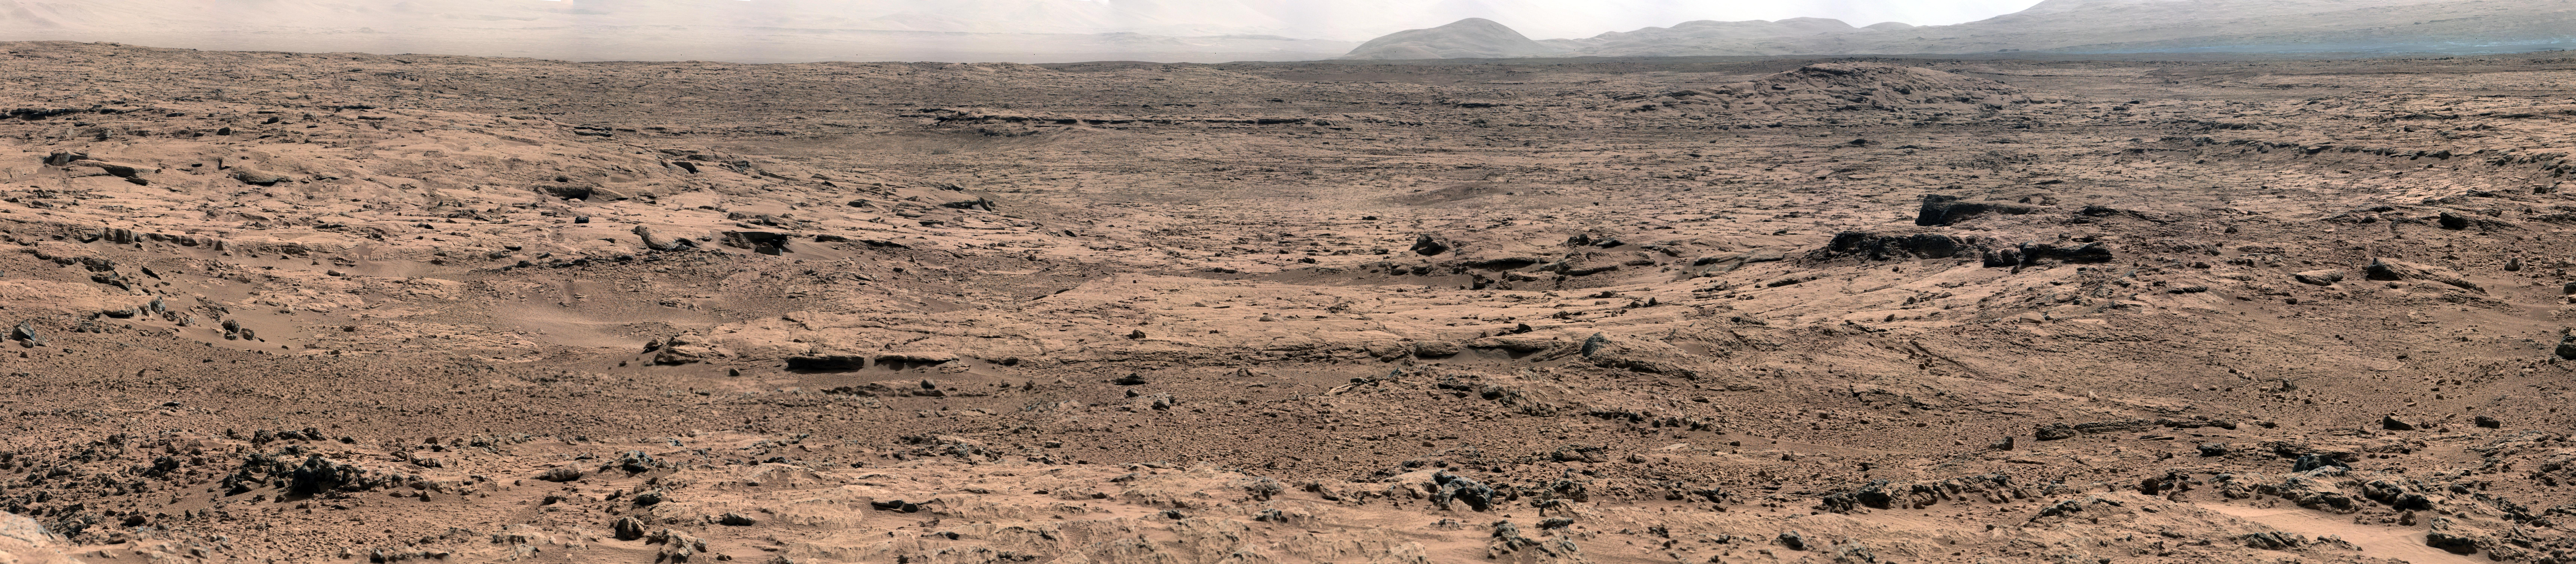 File:PIA16453-MarsCuriosityRover-RocknestPanorama-20121126.jpg